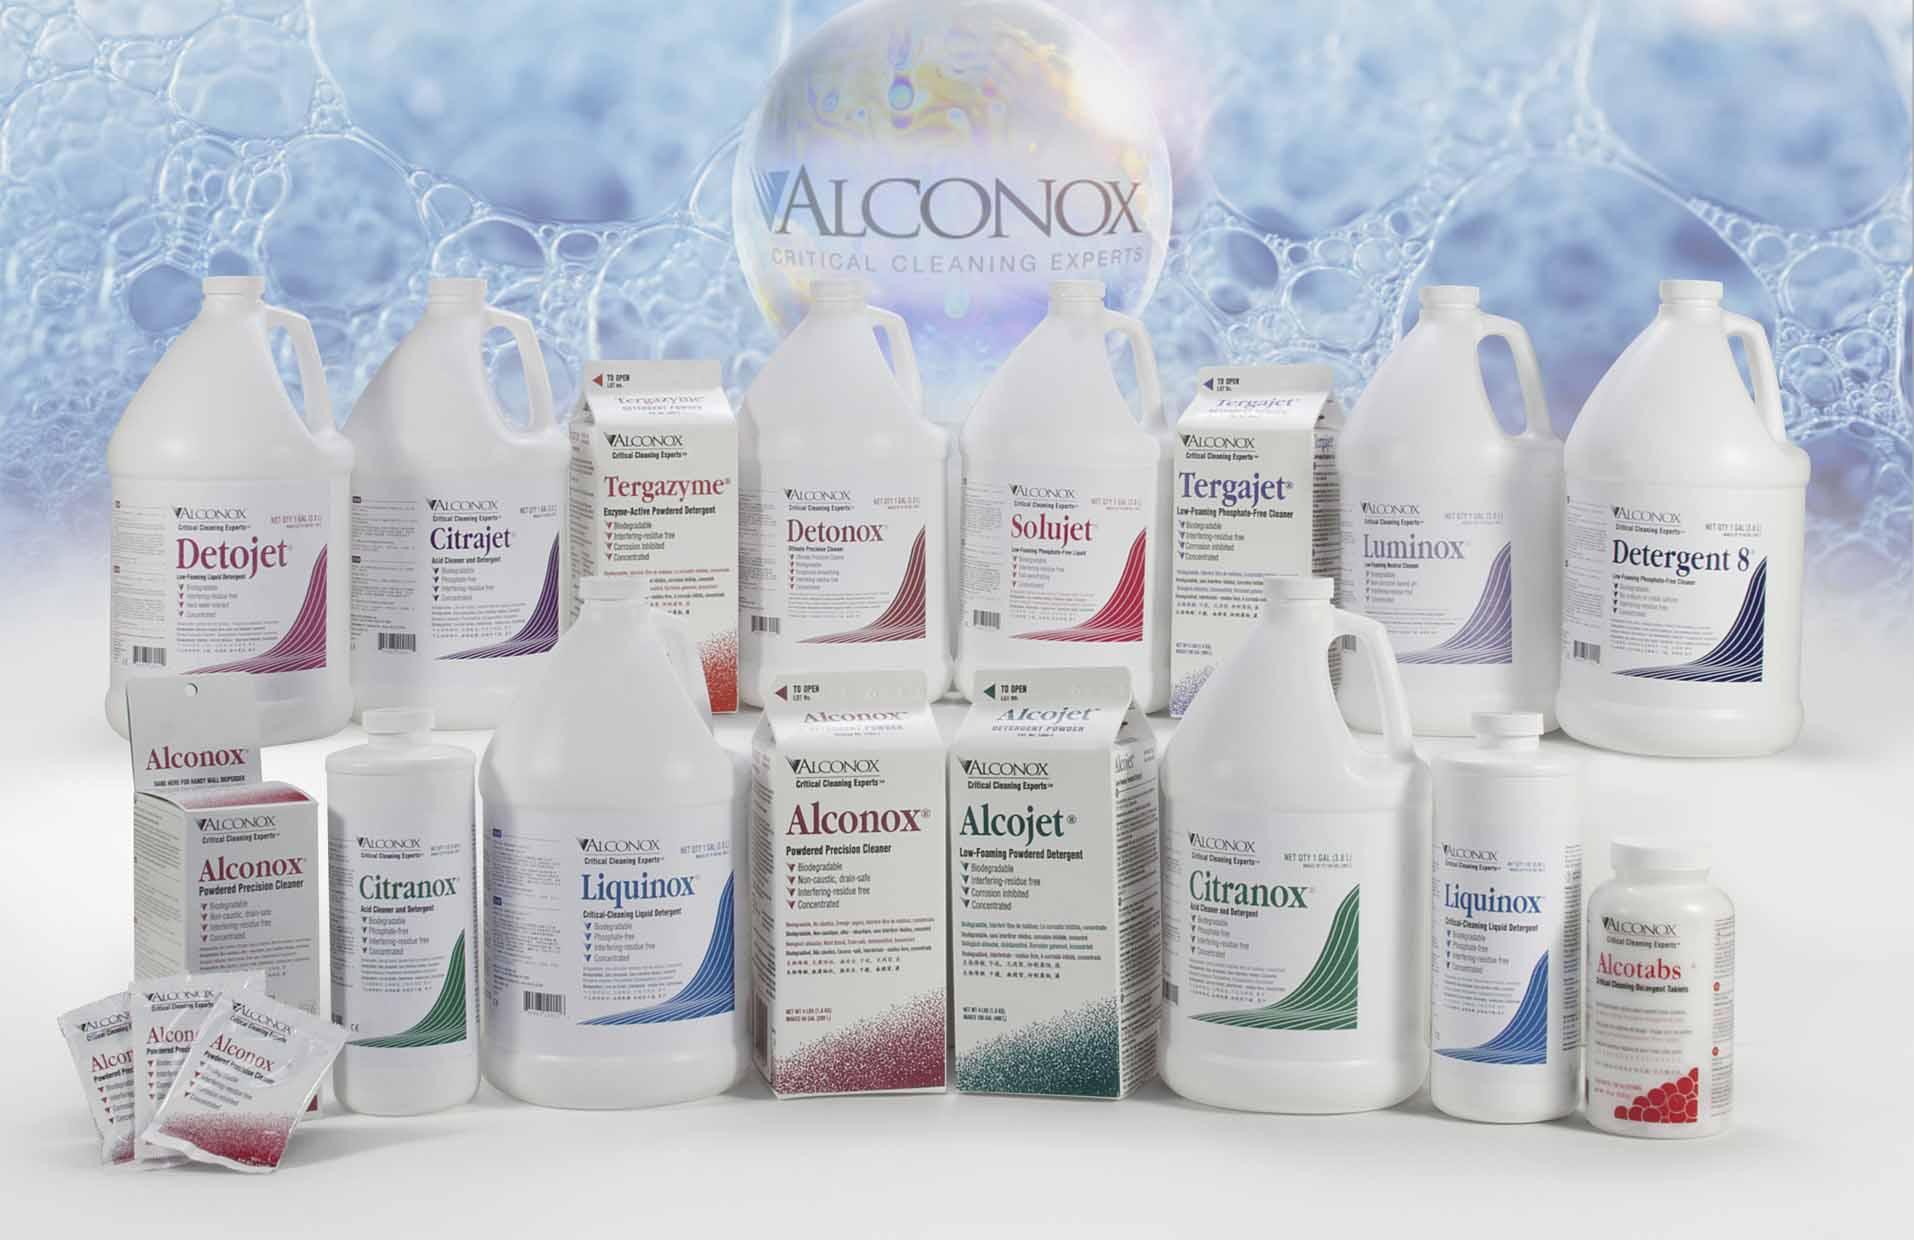 Alconox detergents